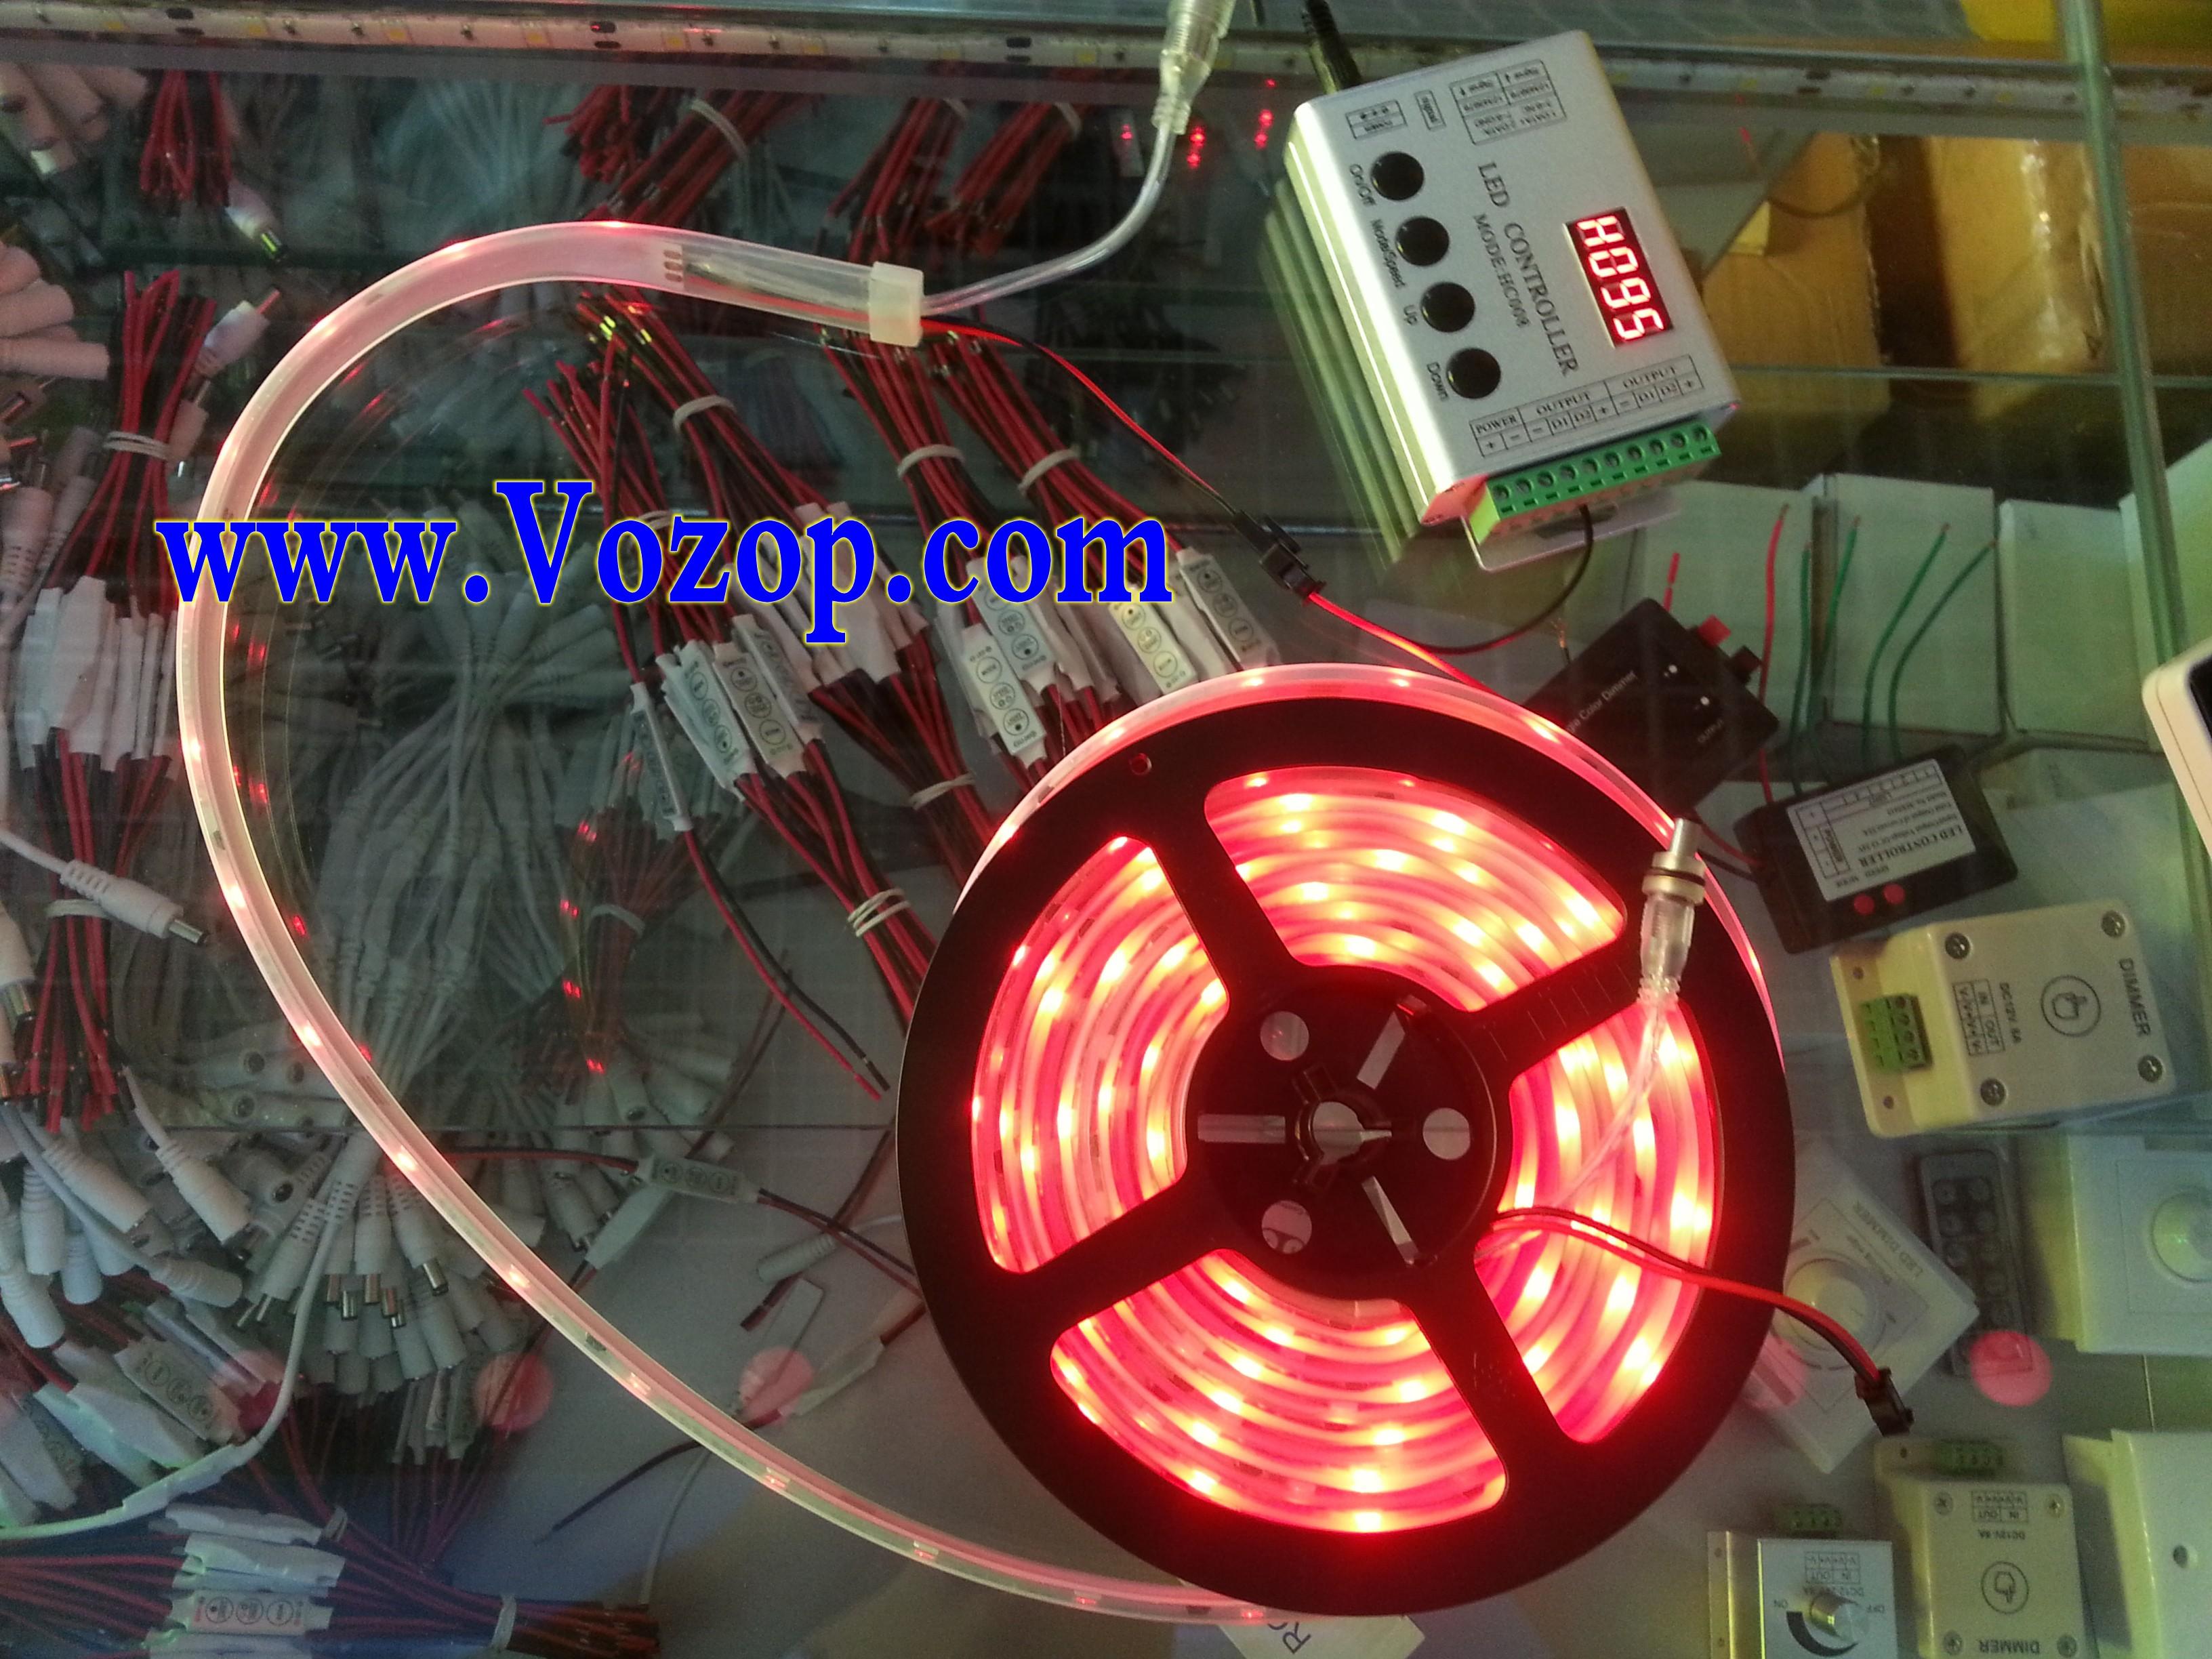 5M_Intelligent_TM1812_RGB_5050_Digital_LED_Strip_with_Controller